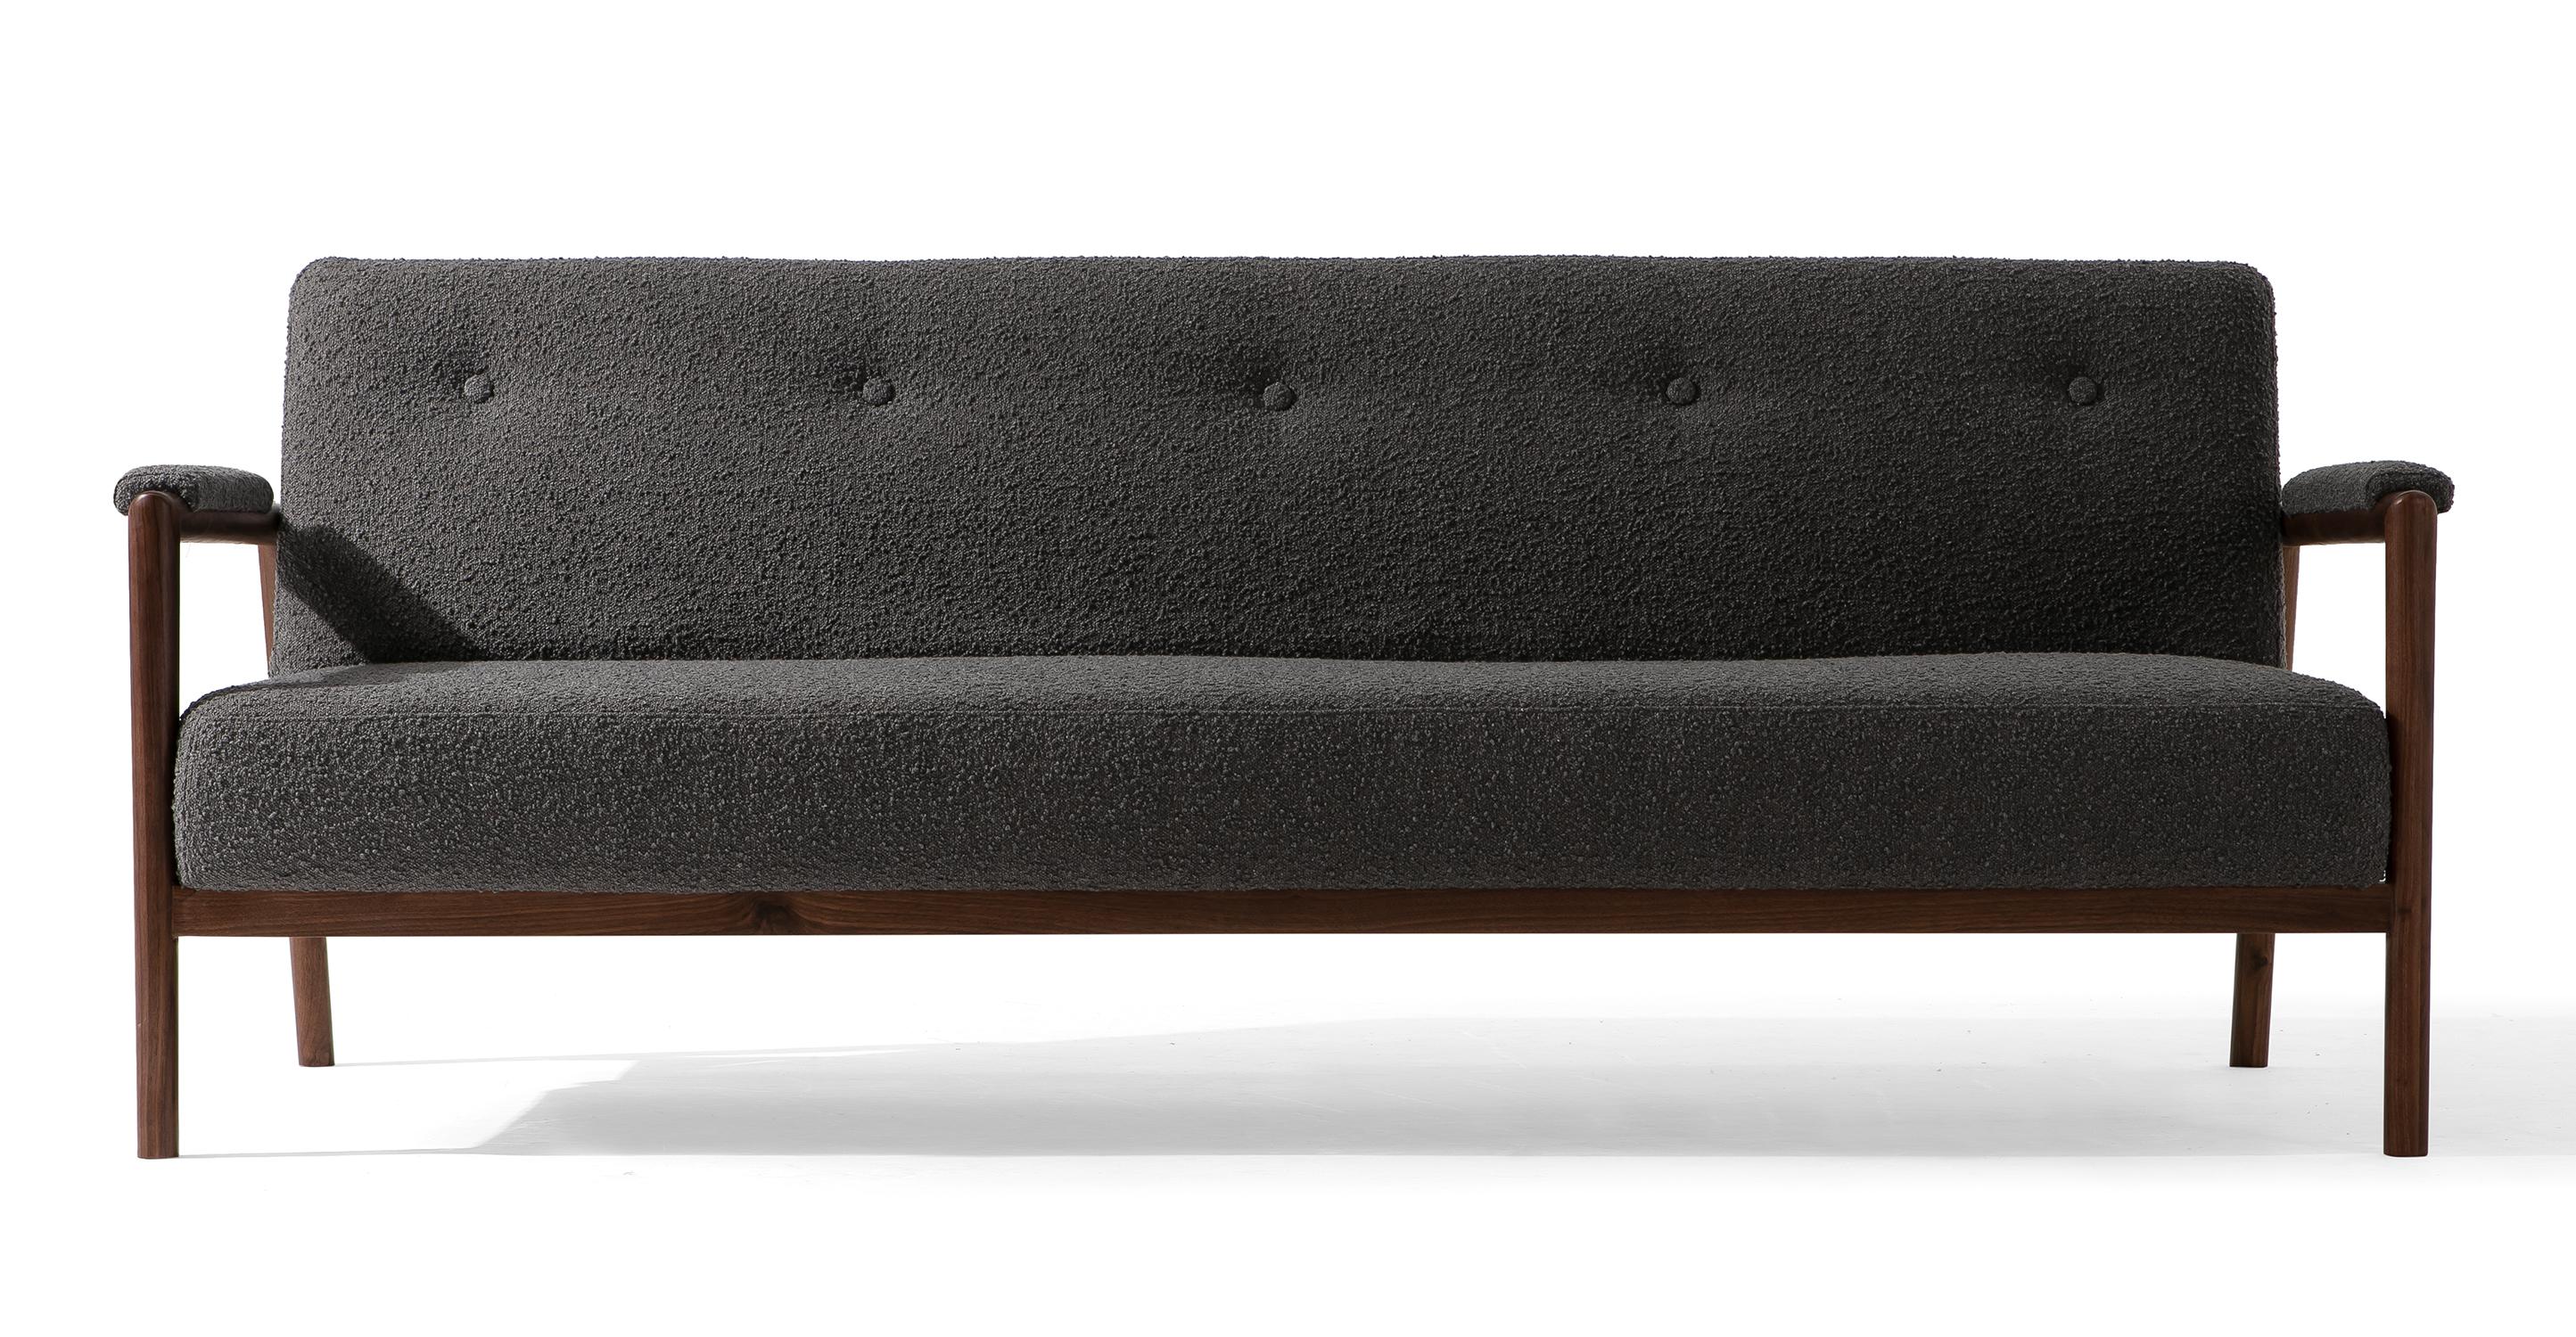 "Orson 85"" Fabric Sofa Sleeper, Gris Boucle"